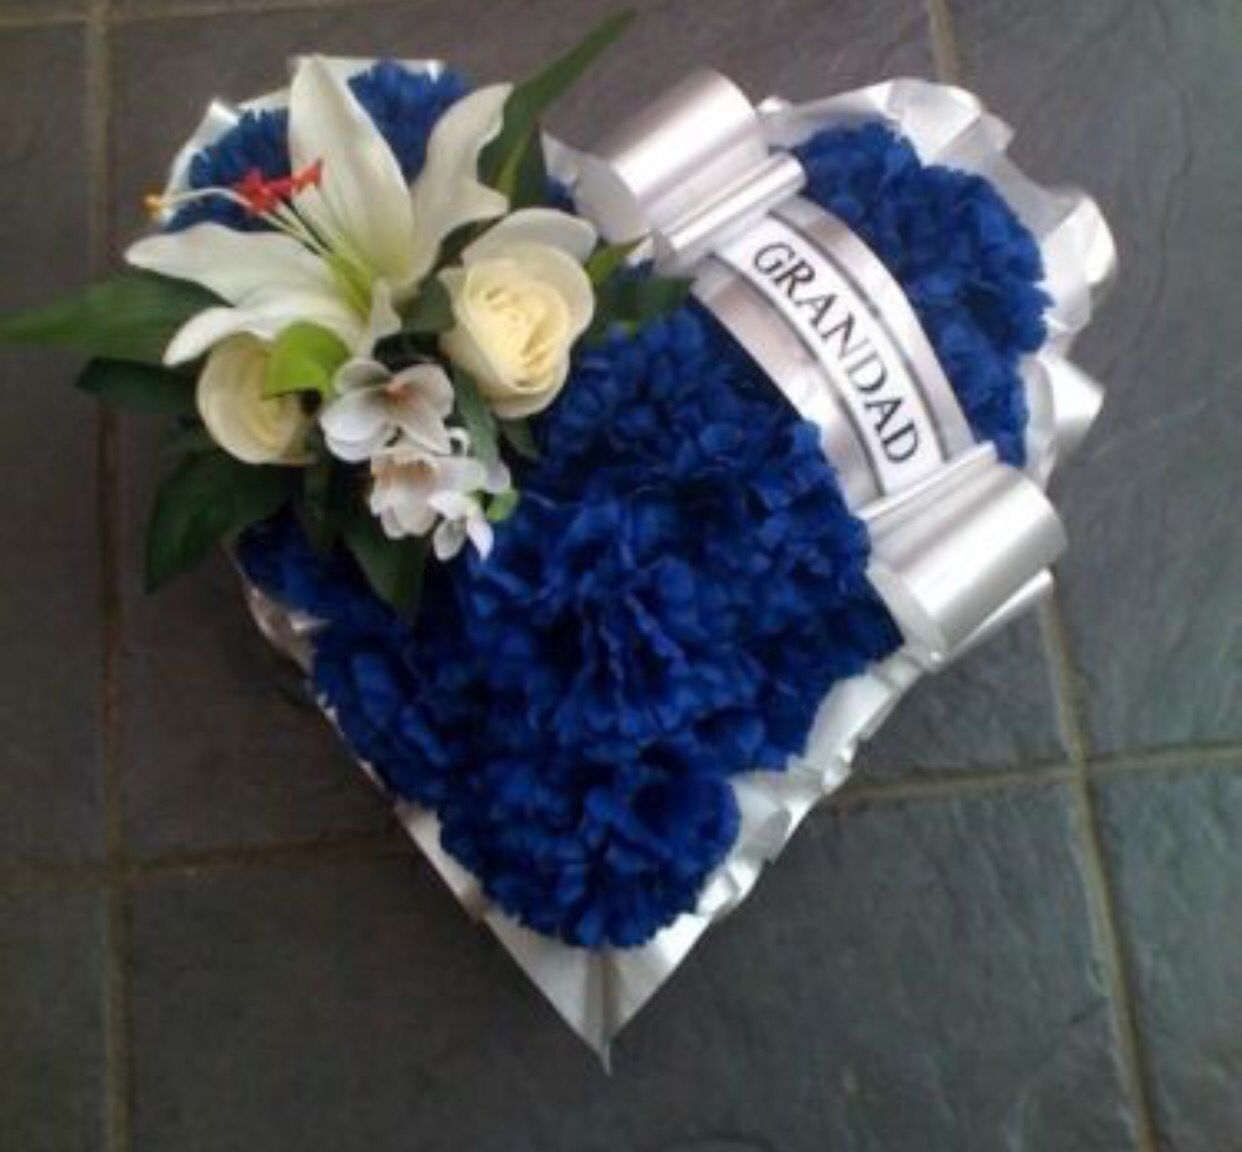 Artificial Funeral Arrangements Flower Arrangements Pinterest